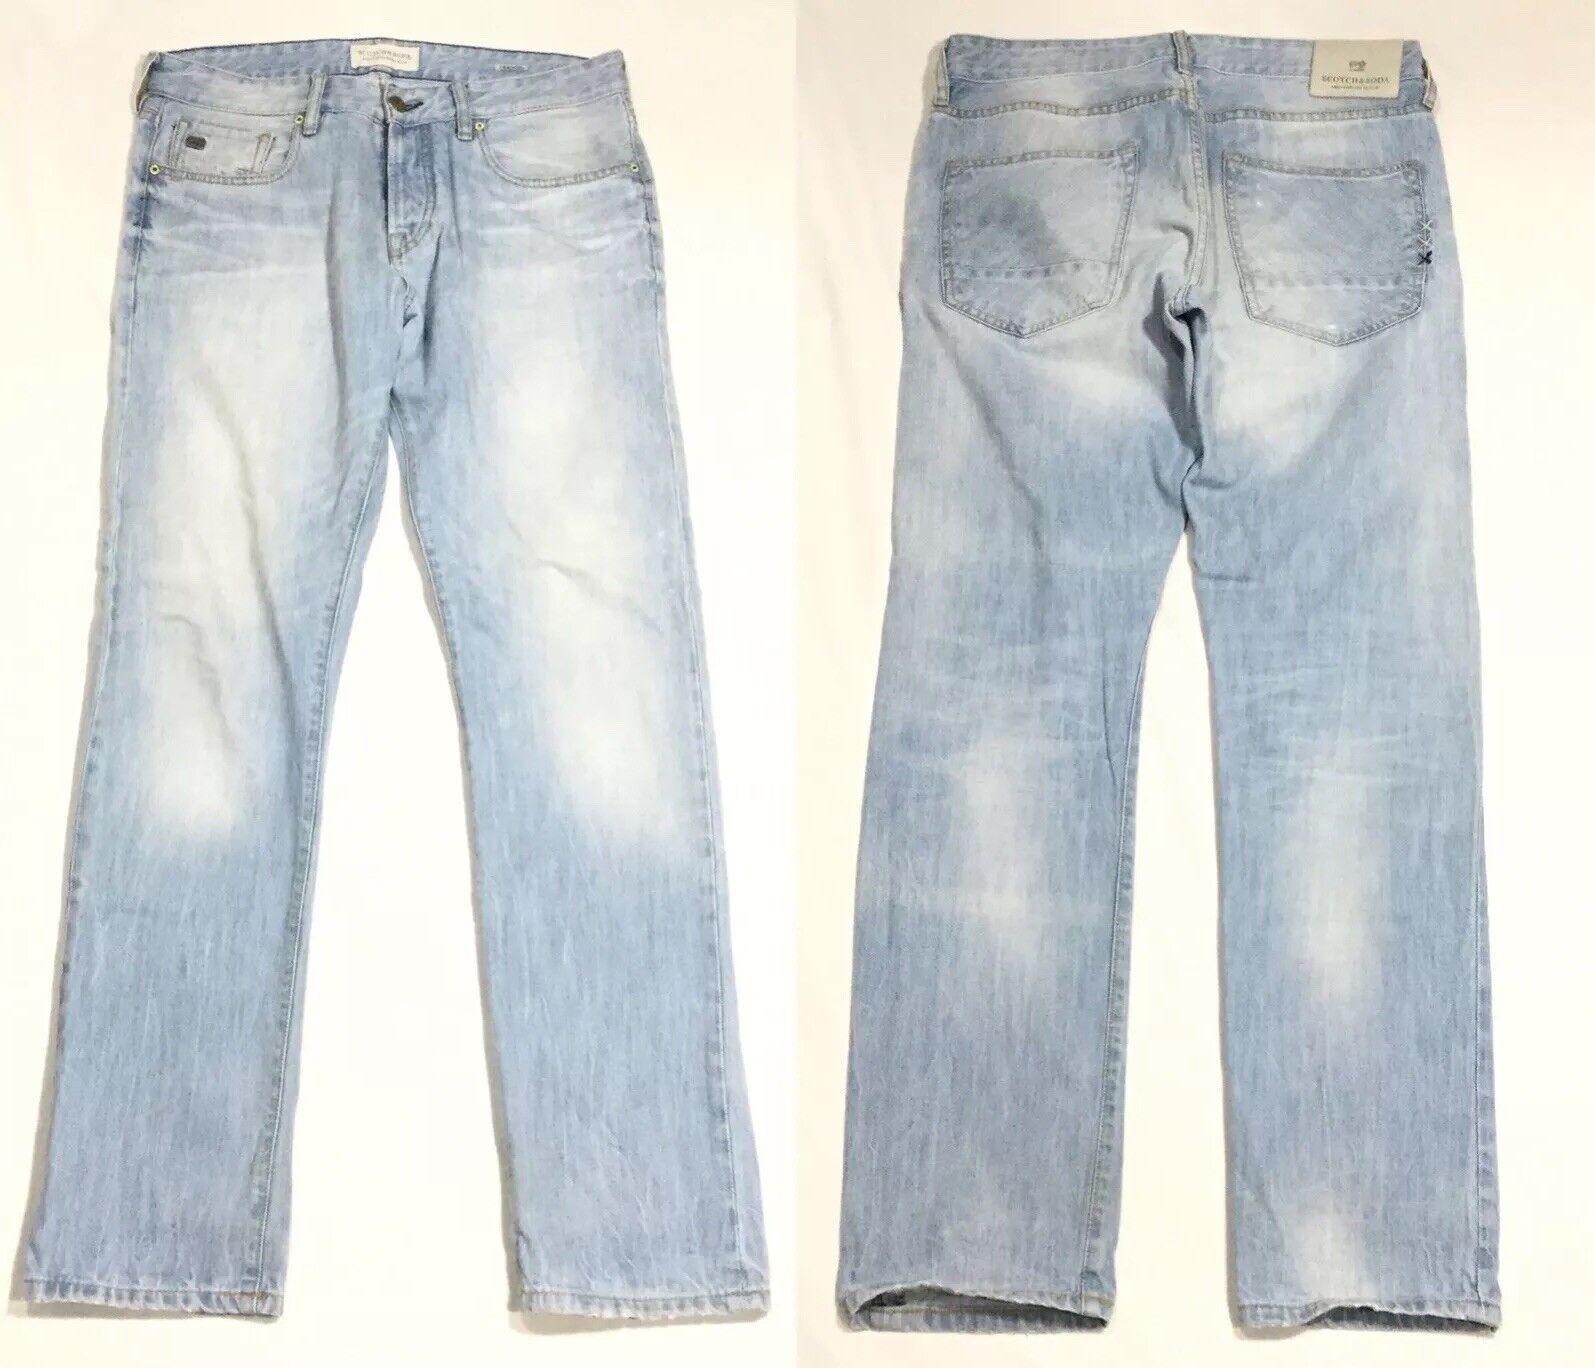 Scotch & Soda Vernon bluee Light Faded Denim Slim Fit Jeans gold Rush 32x32.5 Men